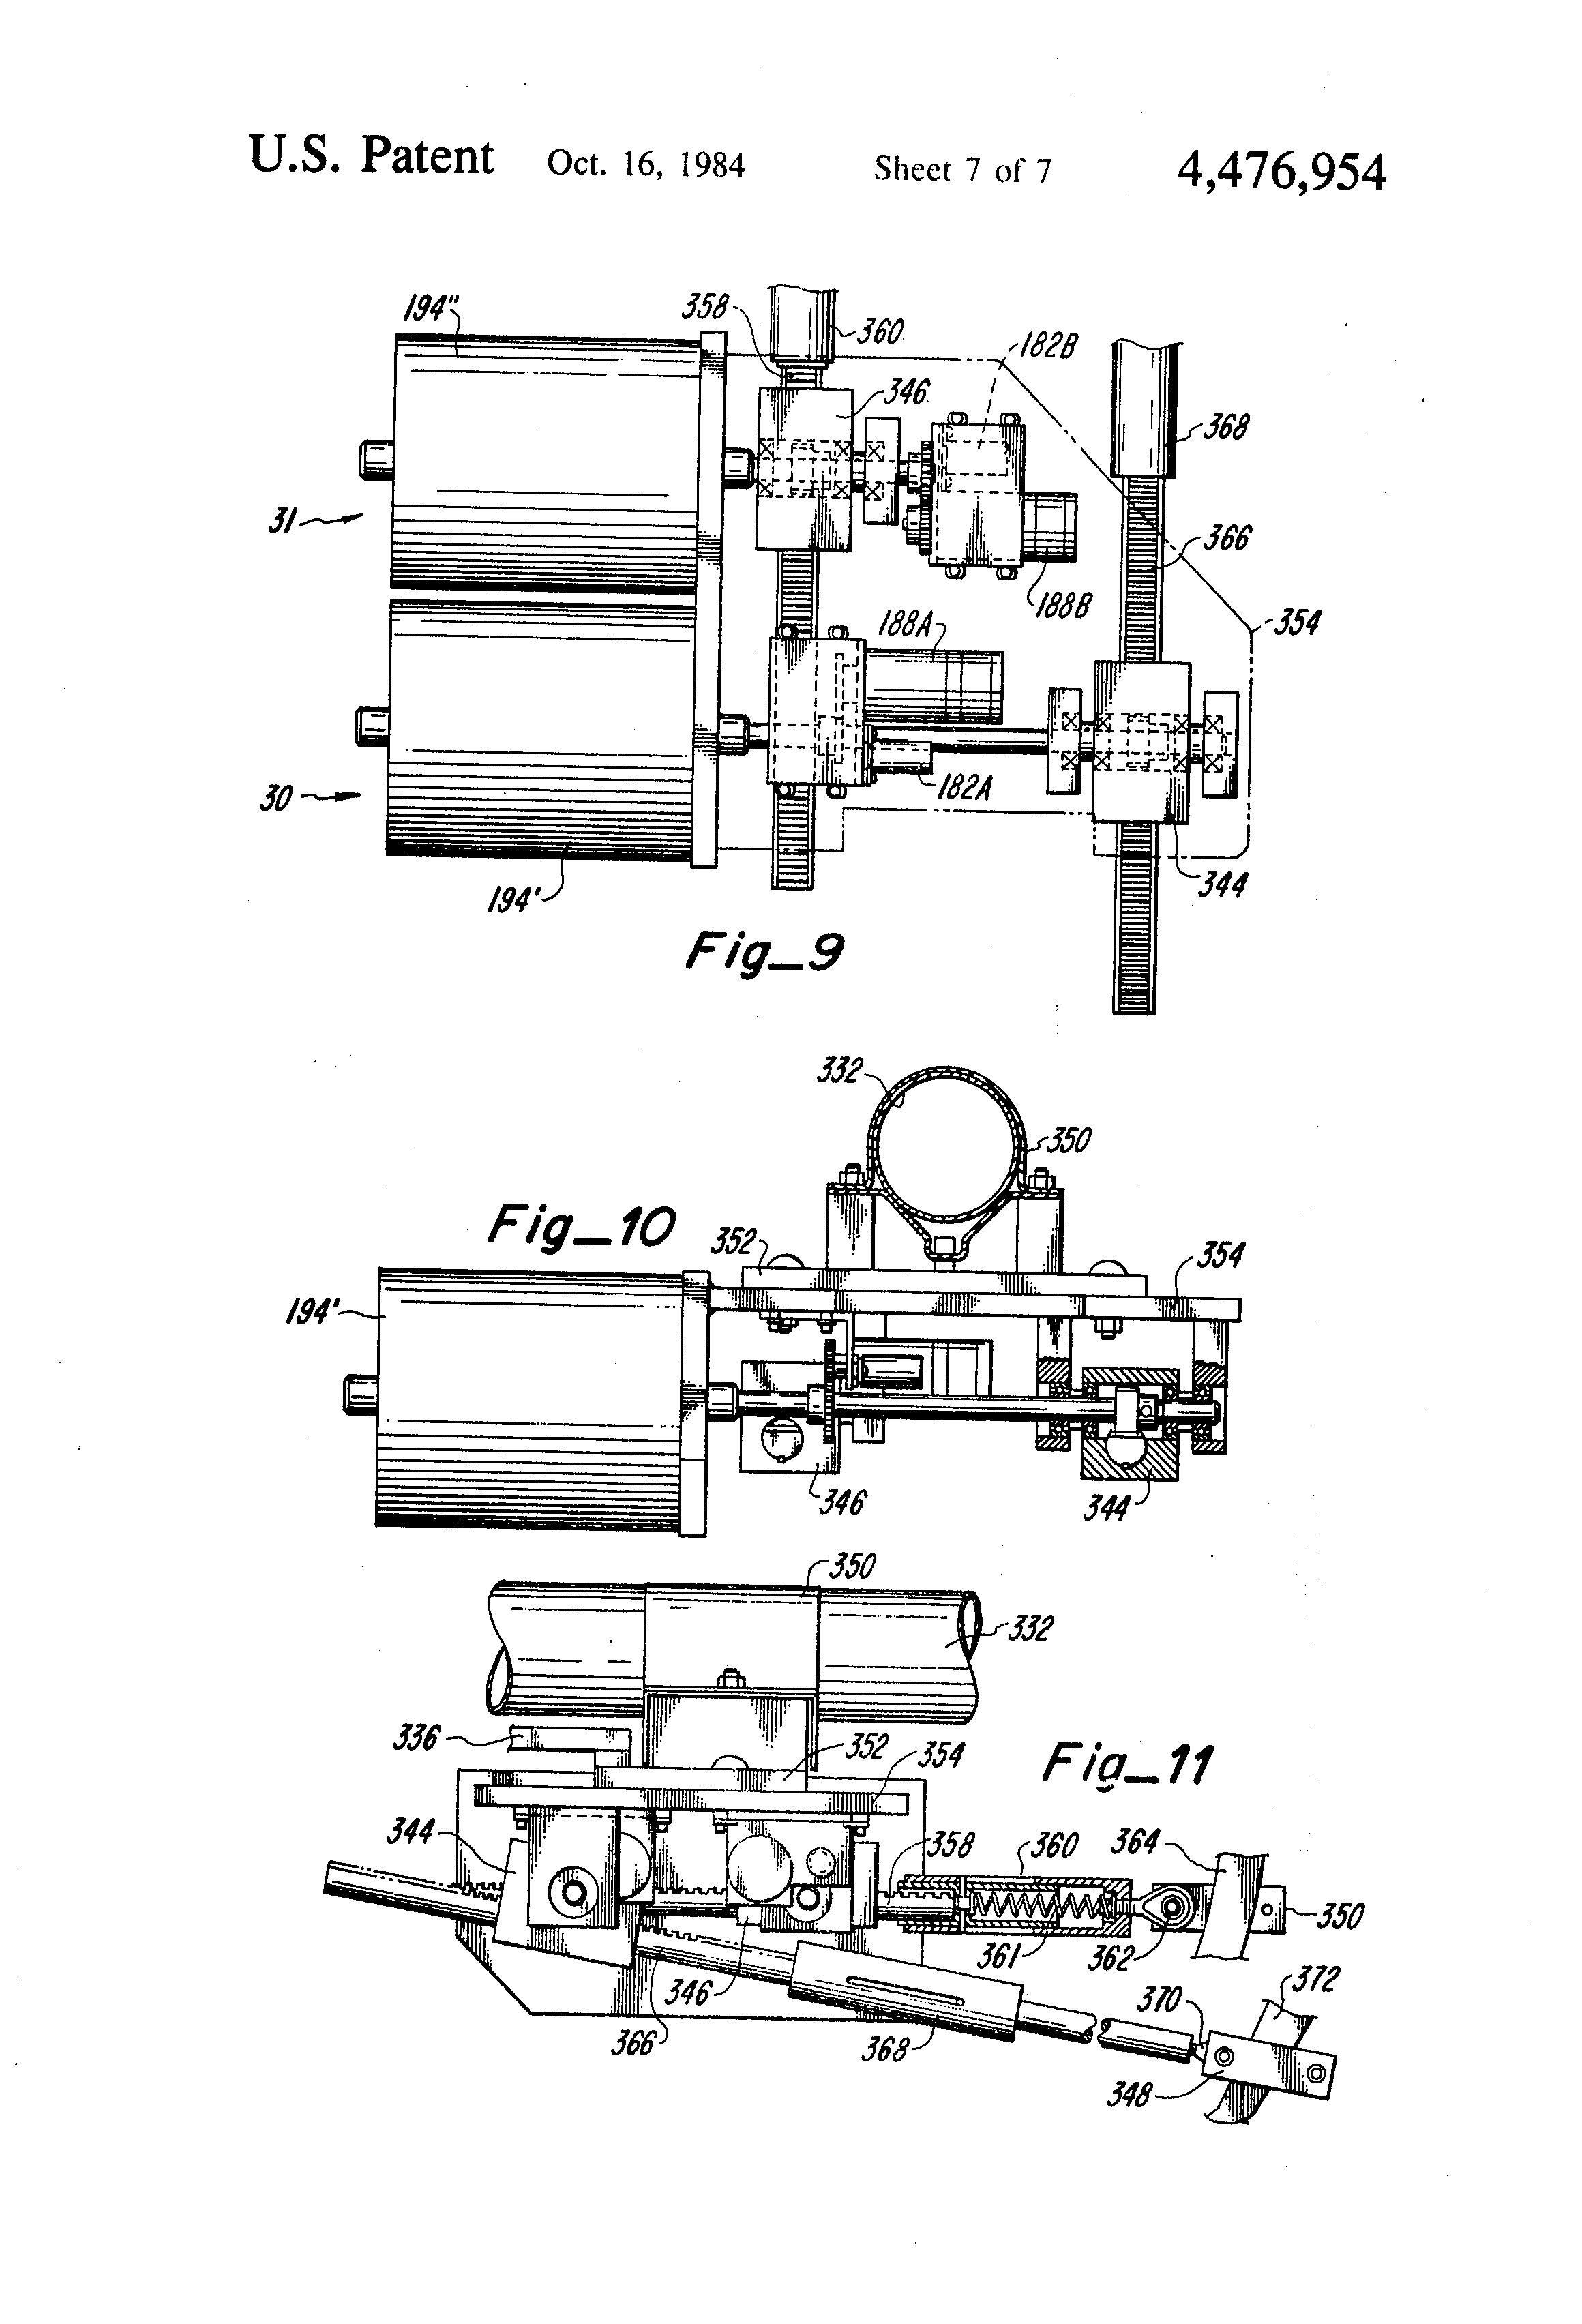 John Deere 270 Skid Steer Schematic Block And Diagrams